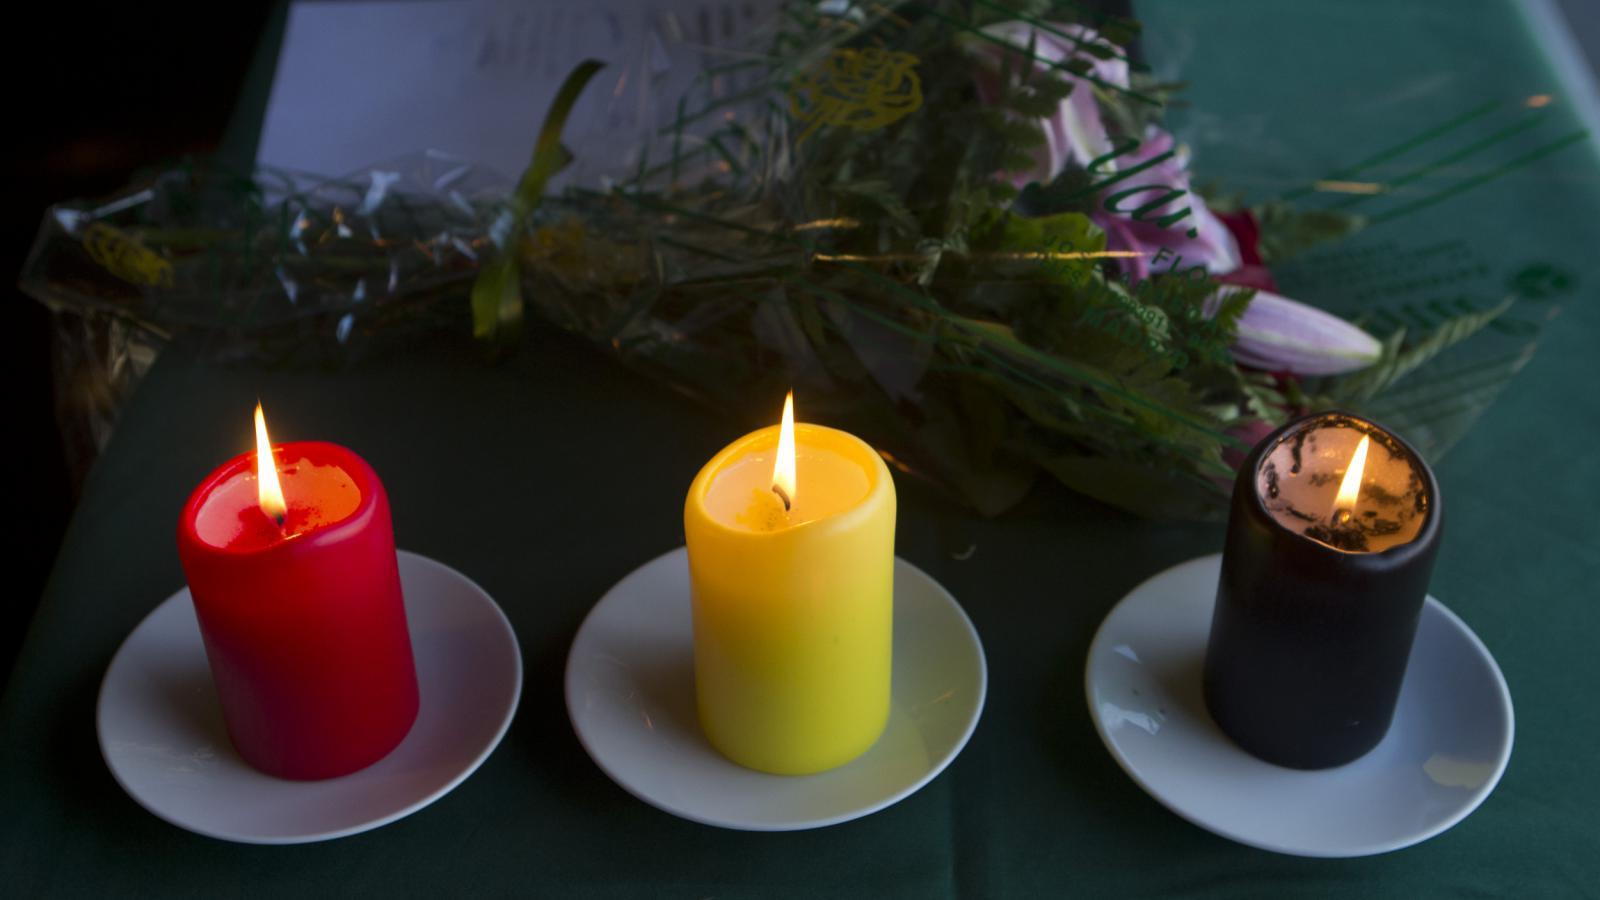 Smutek v Belgii